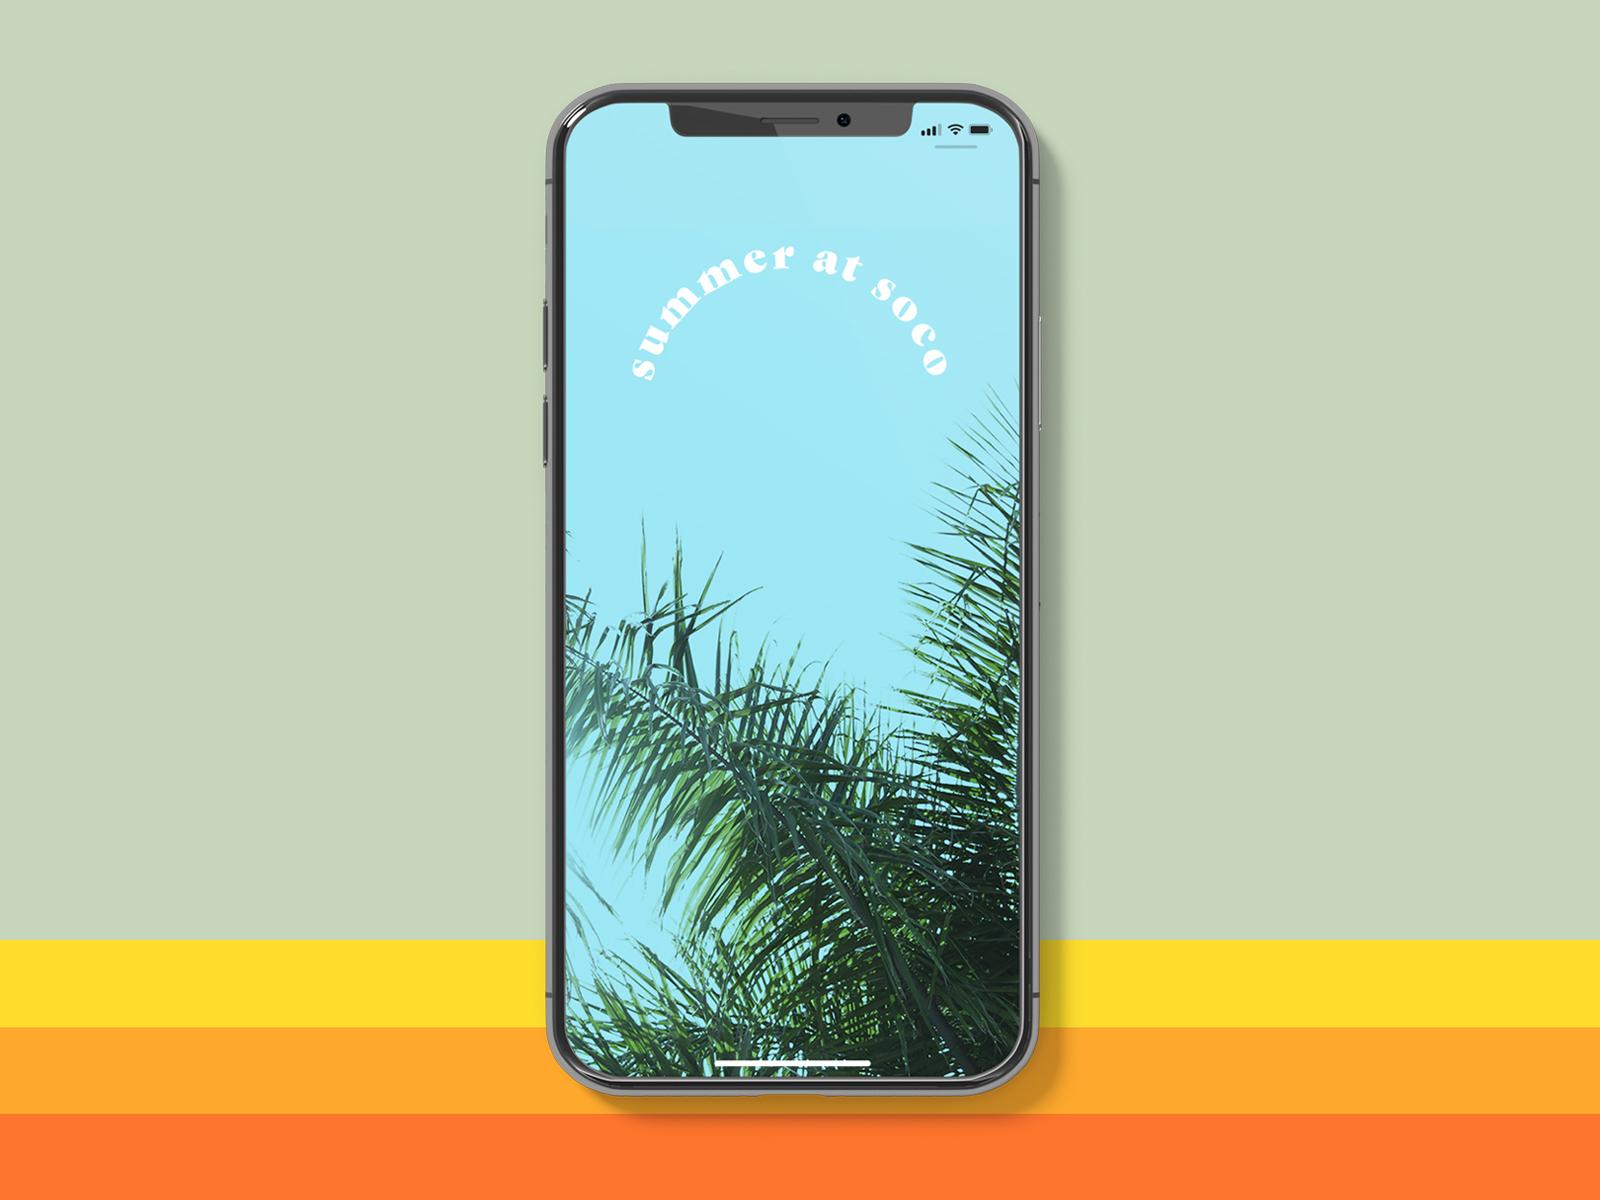 Soco summer iphone